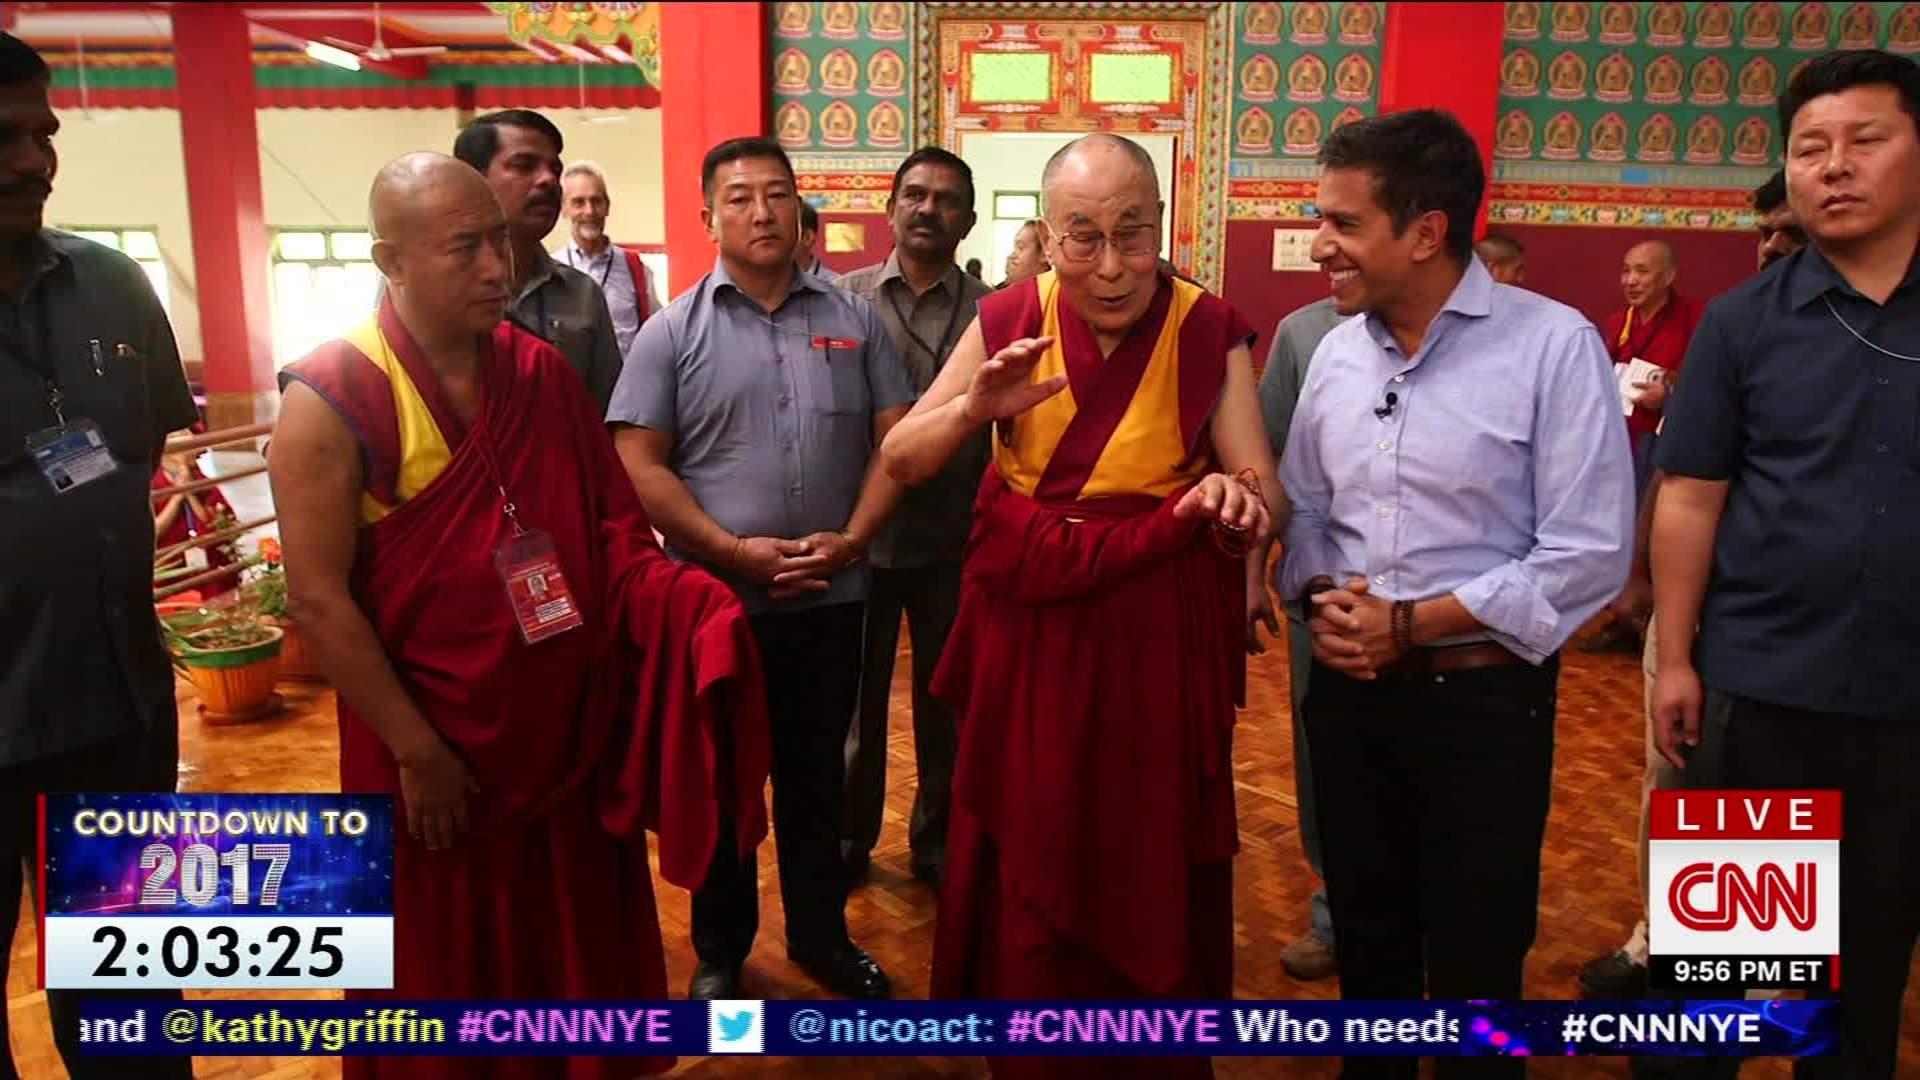 Dalai Lama gives a unique New Year's wish - CNN Video